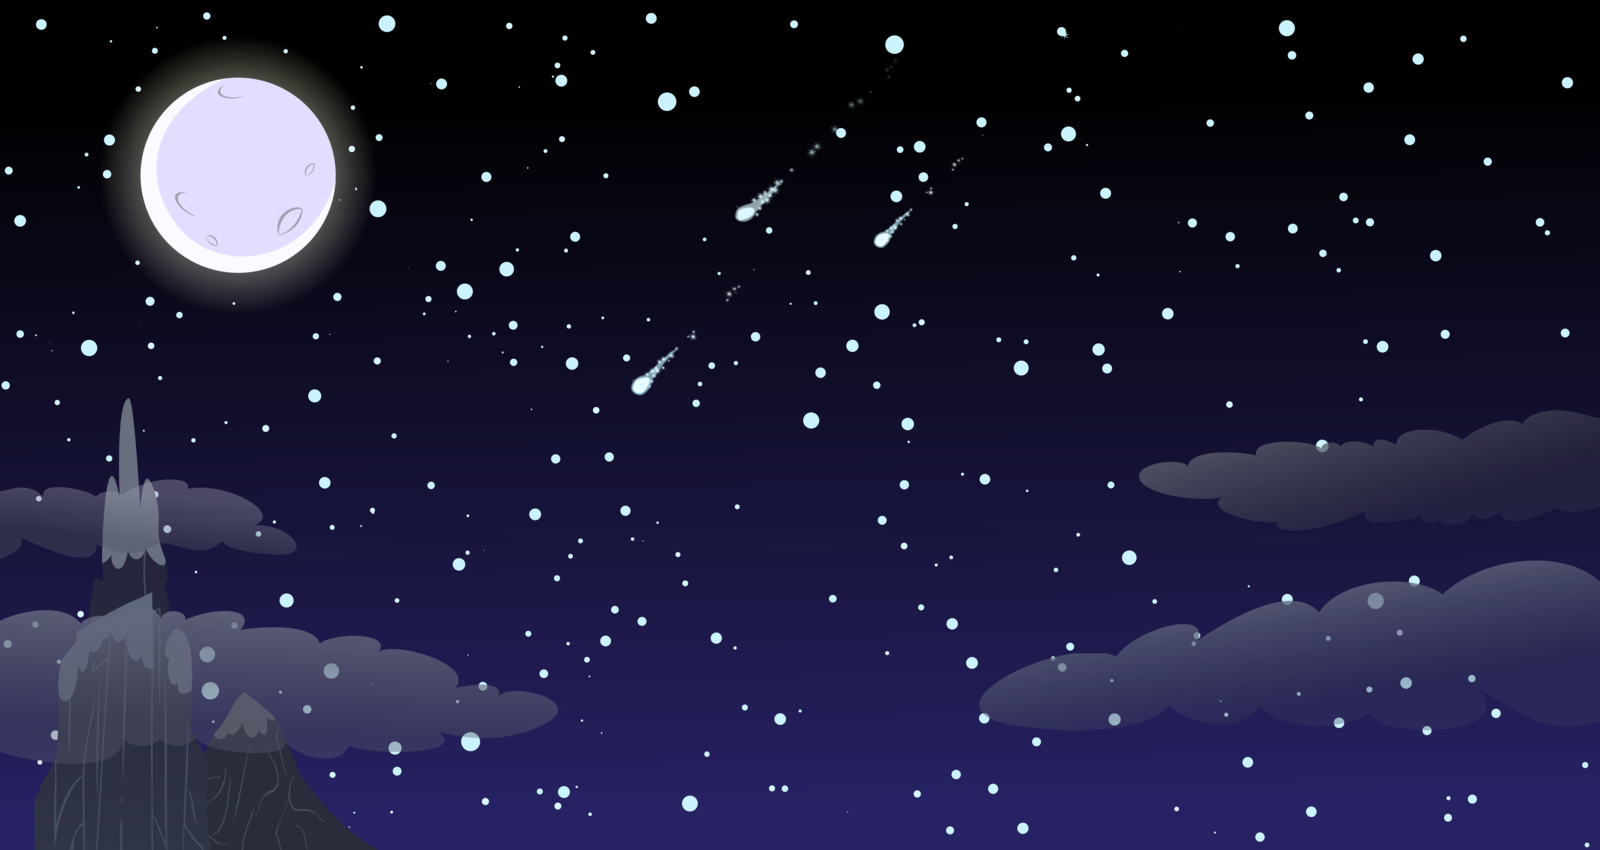 Night Sky Tumblr Background Night background by proenix 1600x850